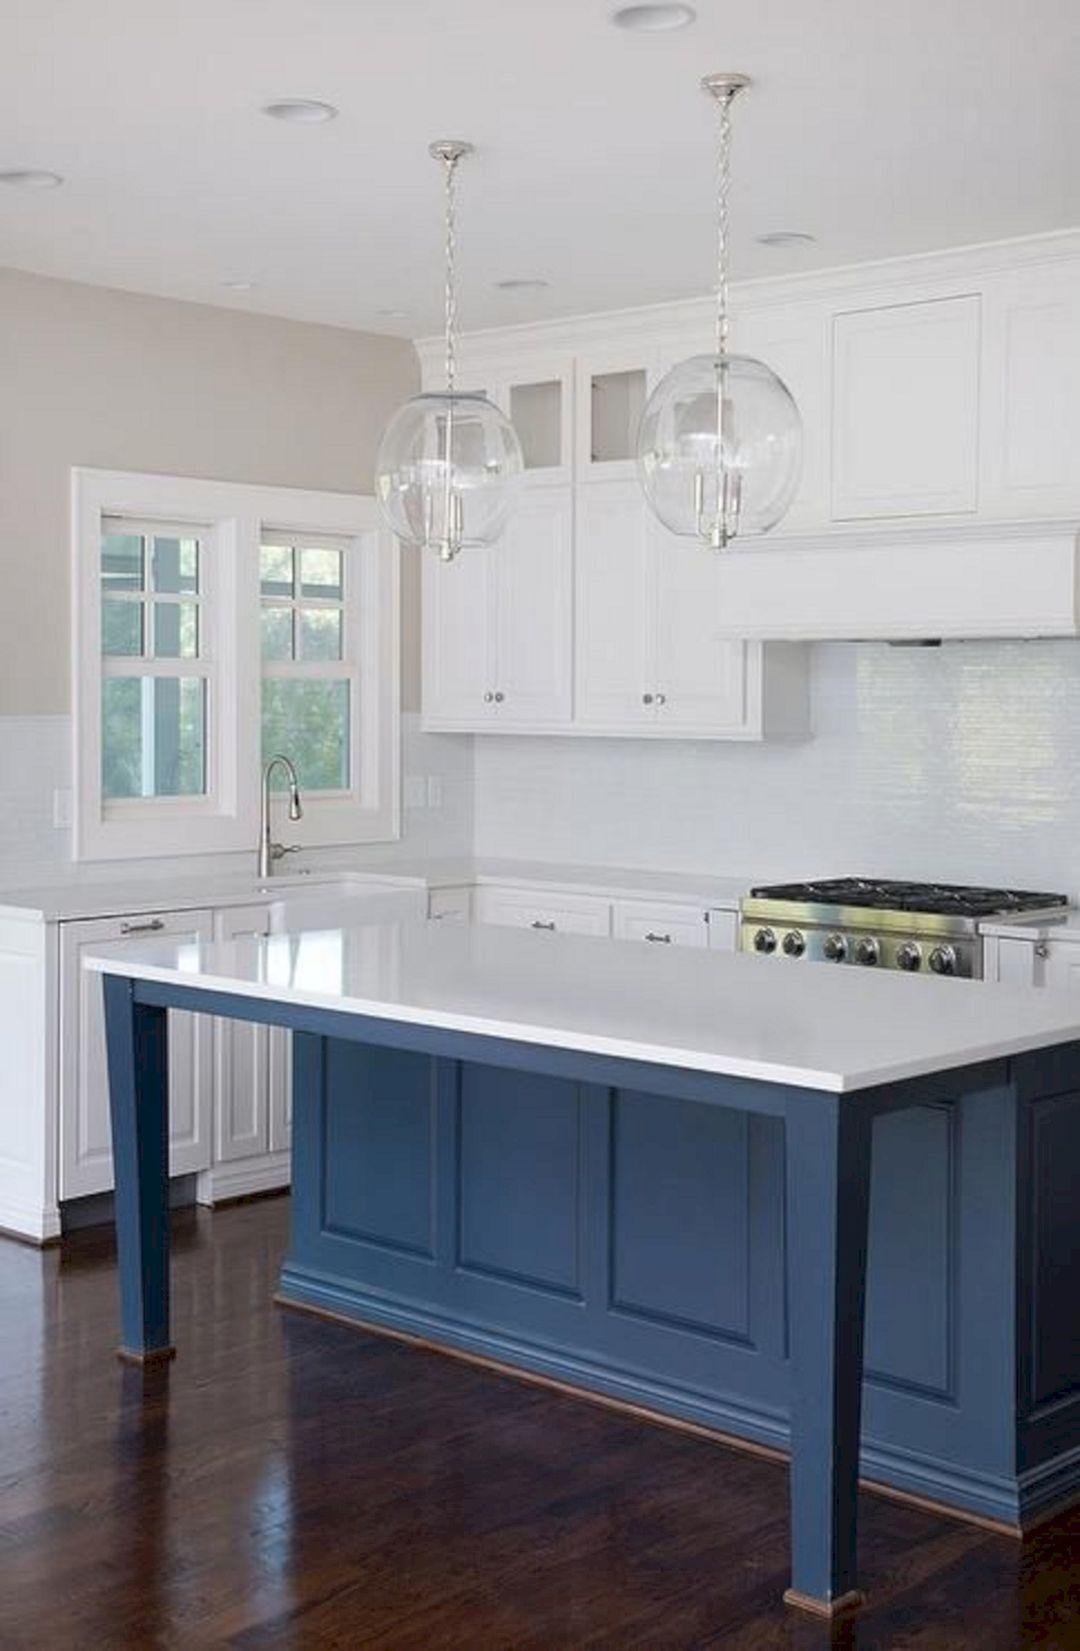 25 elegant white kitchen navy island ideas in 2020 kitchen island design blue kitchen island on farmhouse kitchen navy island id=28704